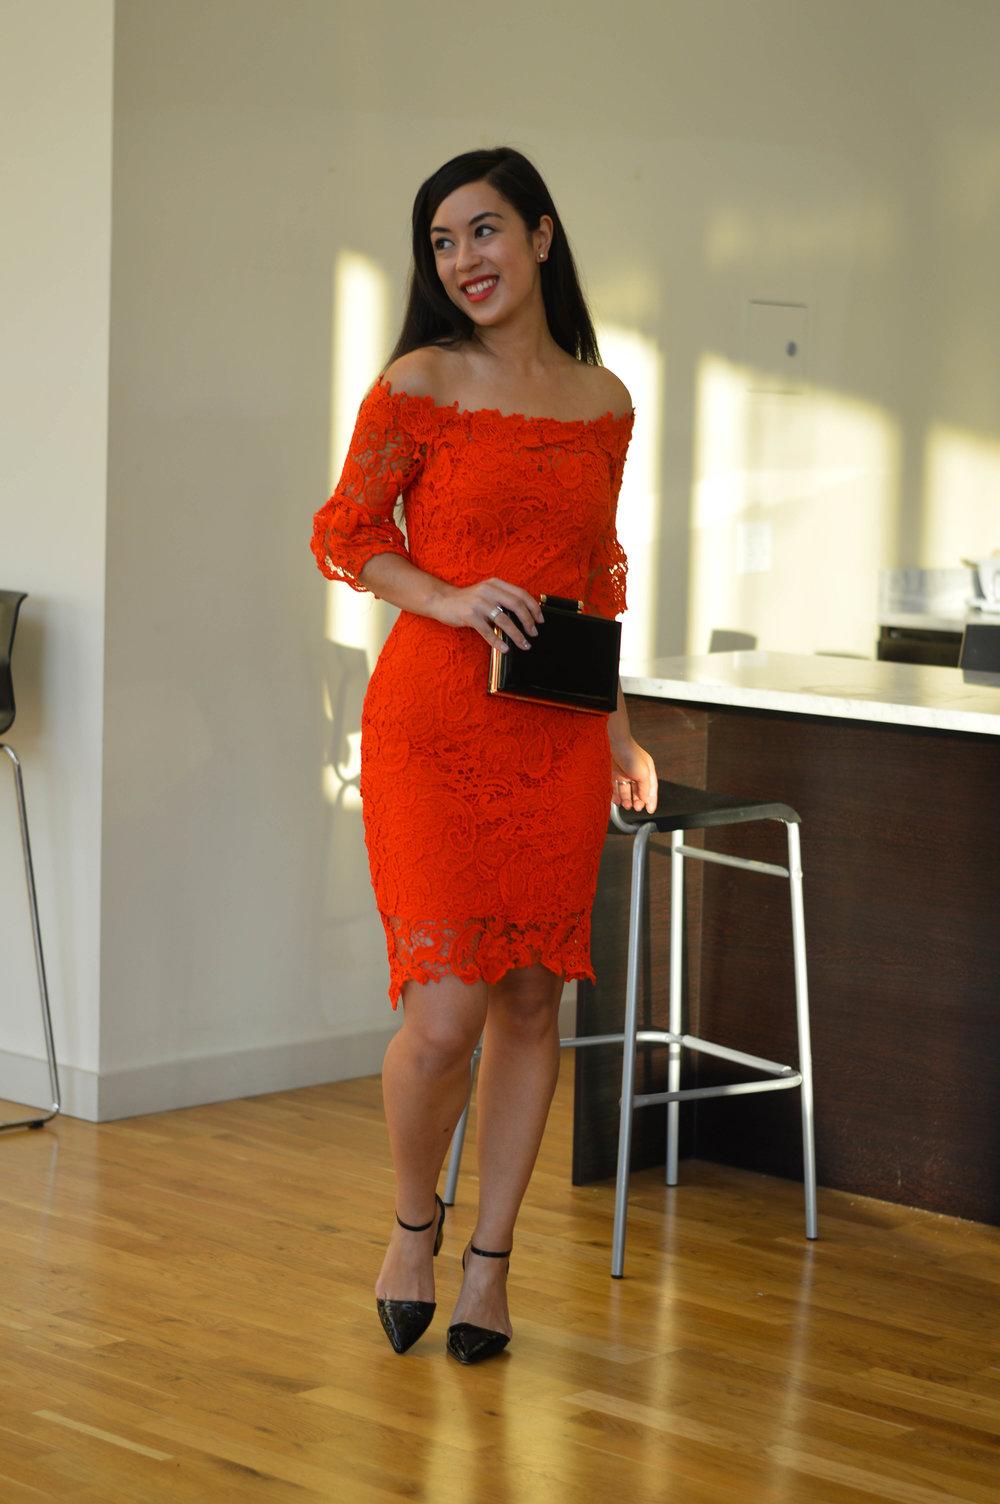 shein red dress